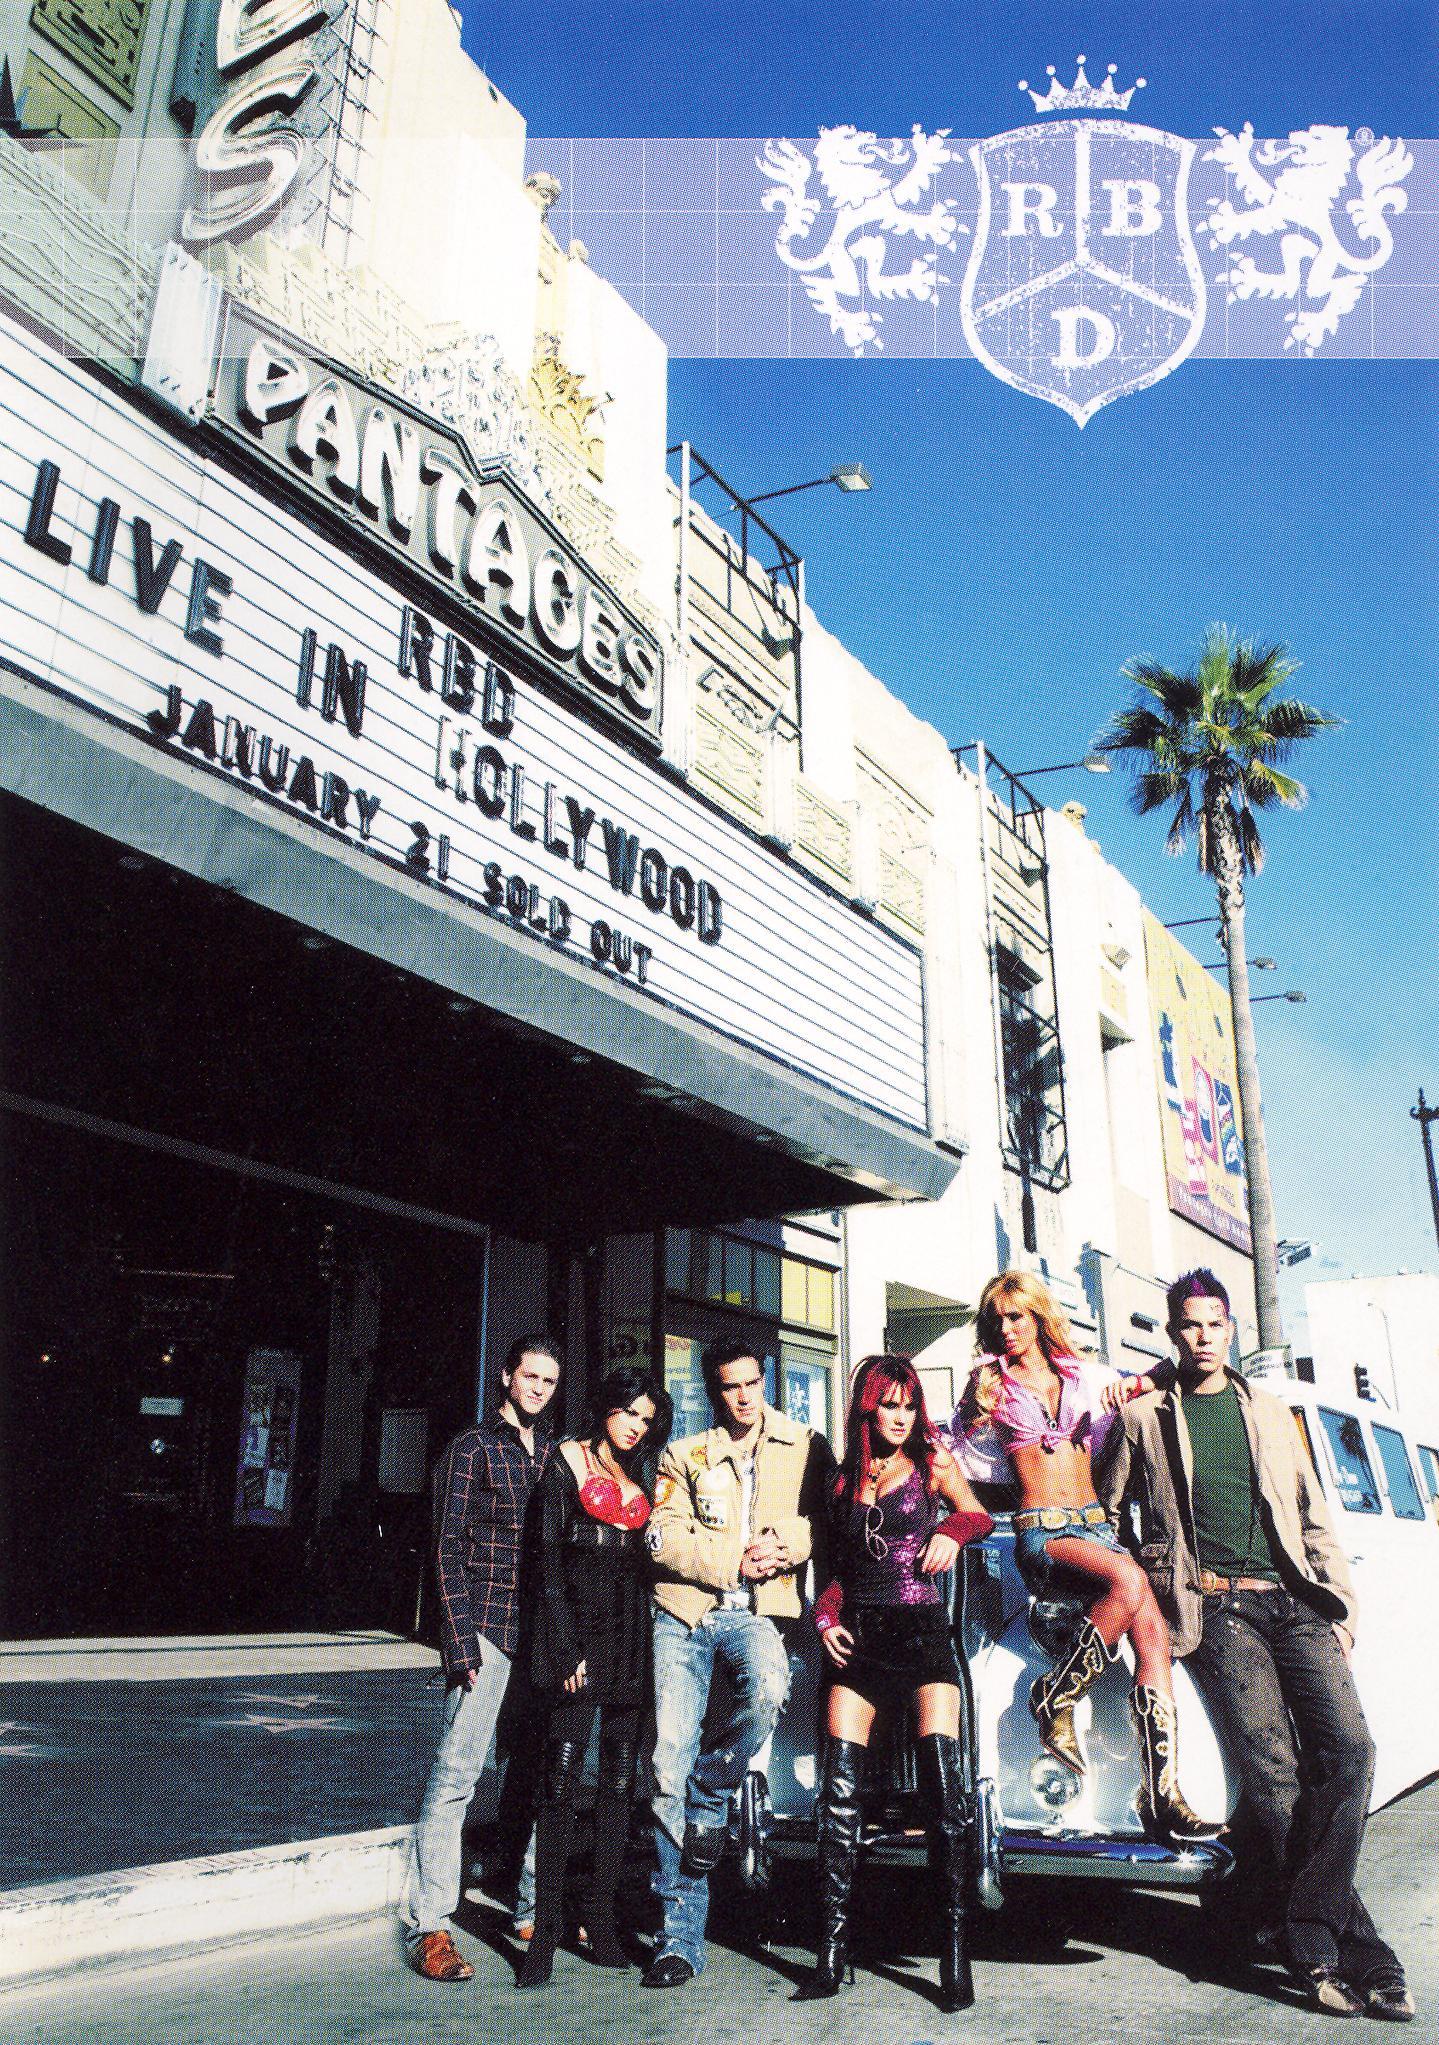 RBD [ Rebelde ]: Live in Hollywood